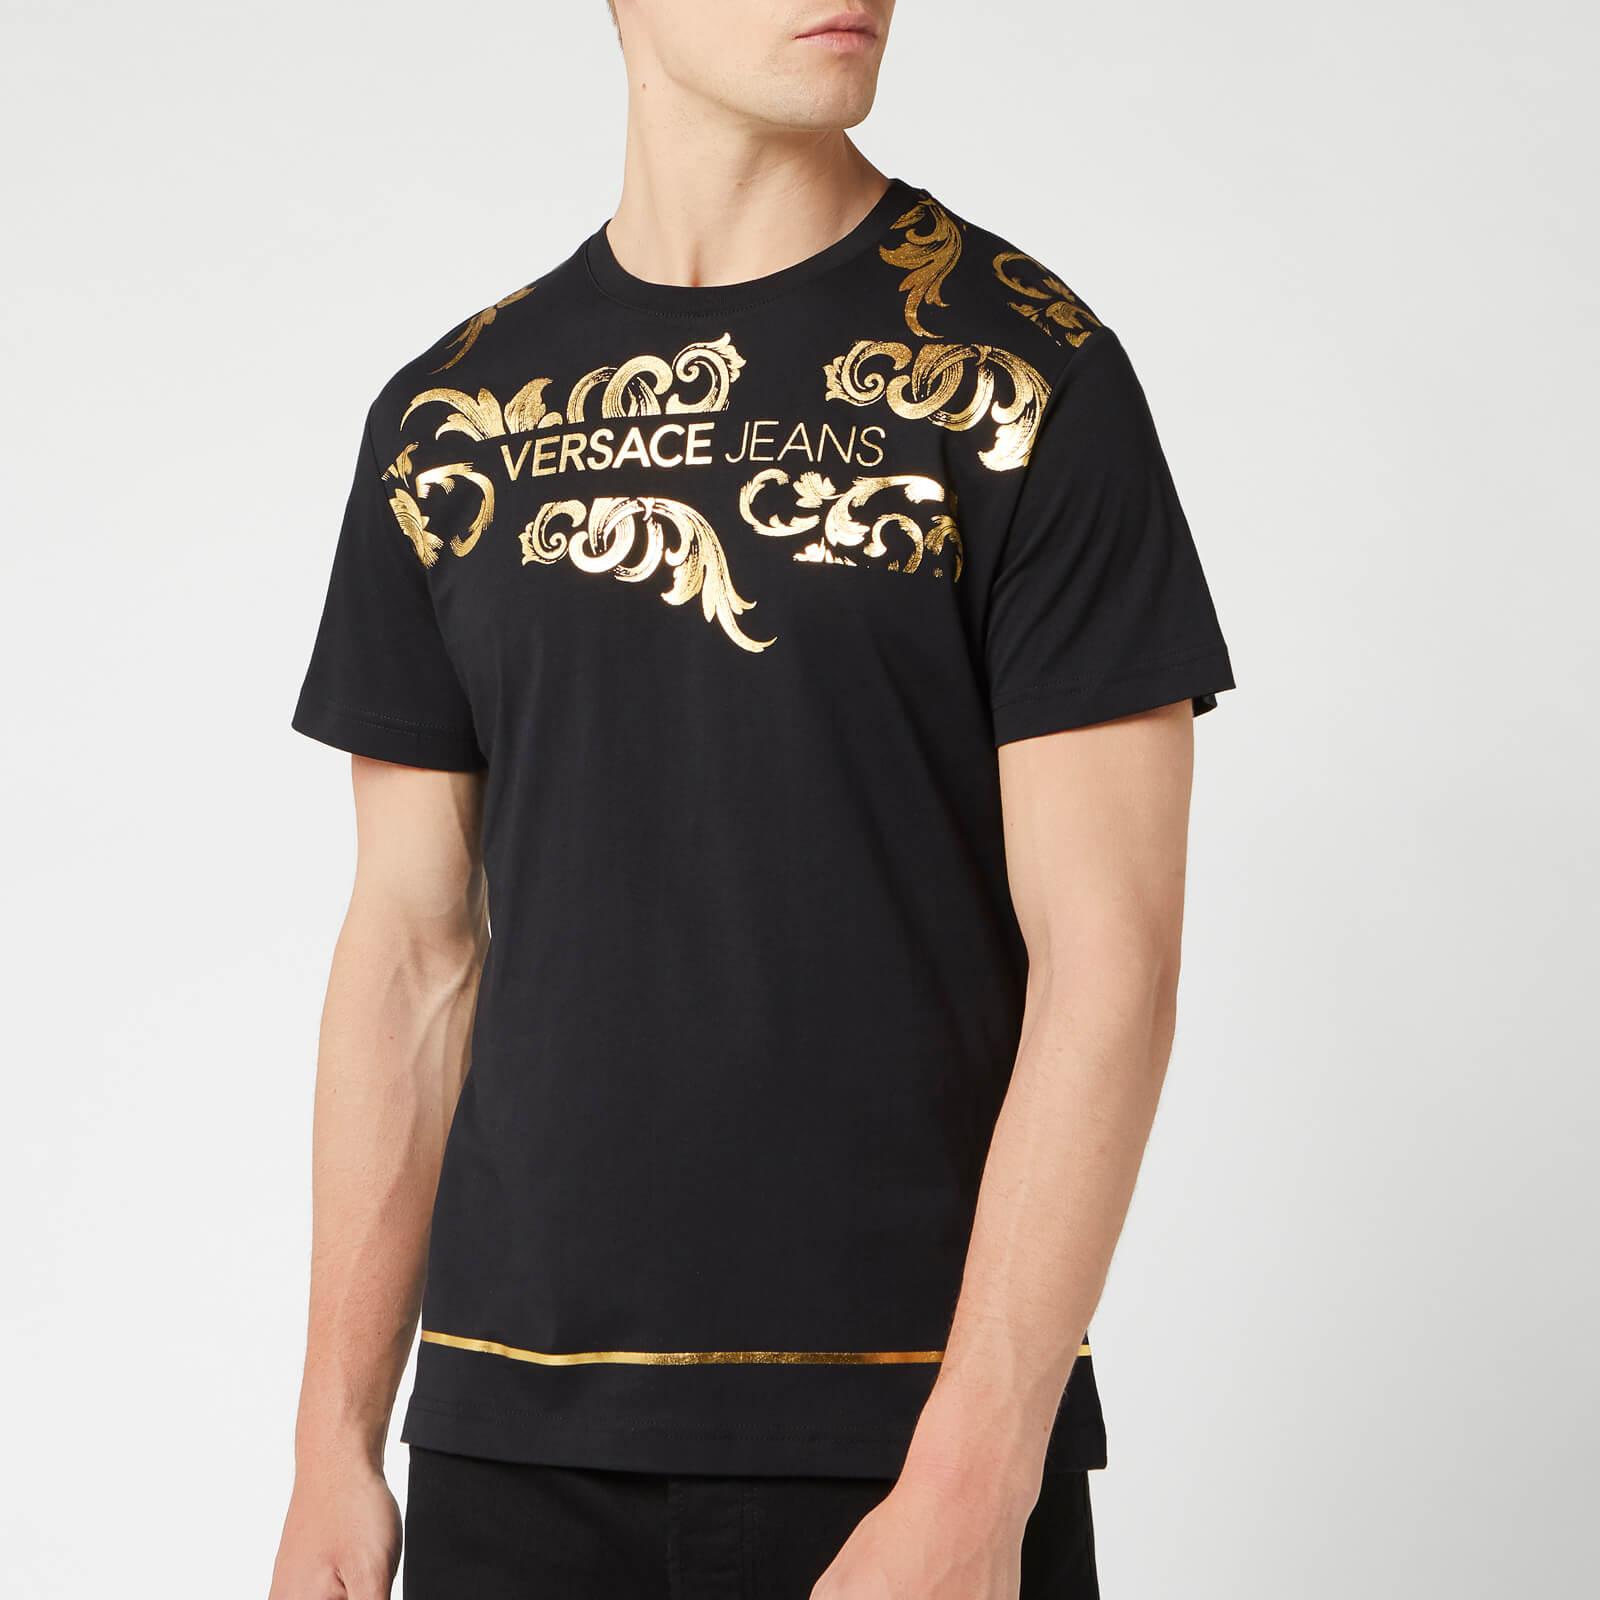 4ba59fc3d Versace Jeans Men's Collar Print T-Shirt - Black Clothing | TheHut.com